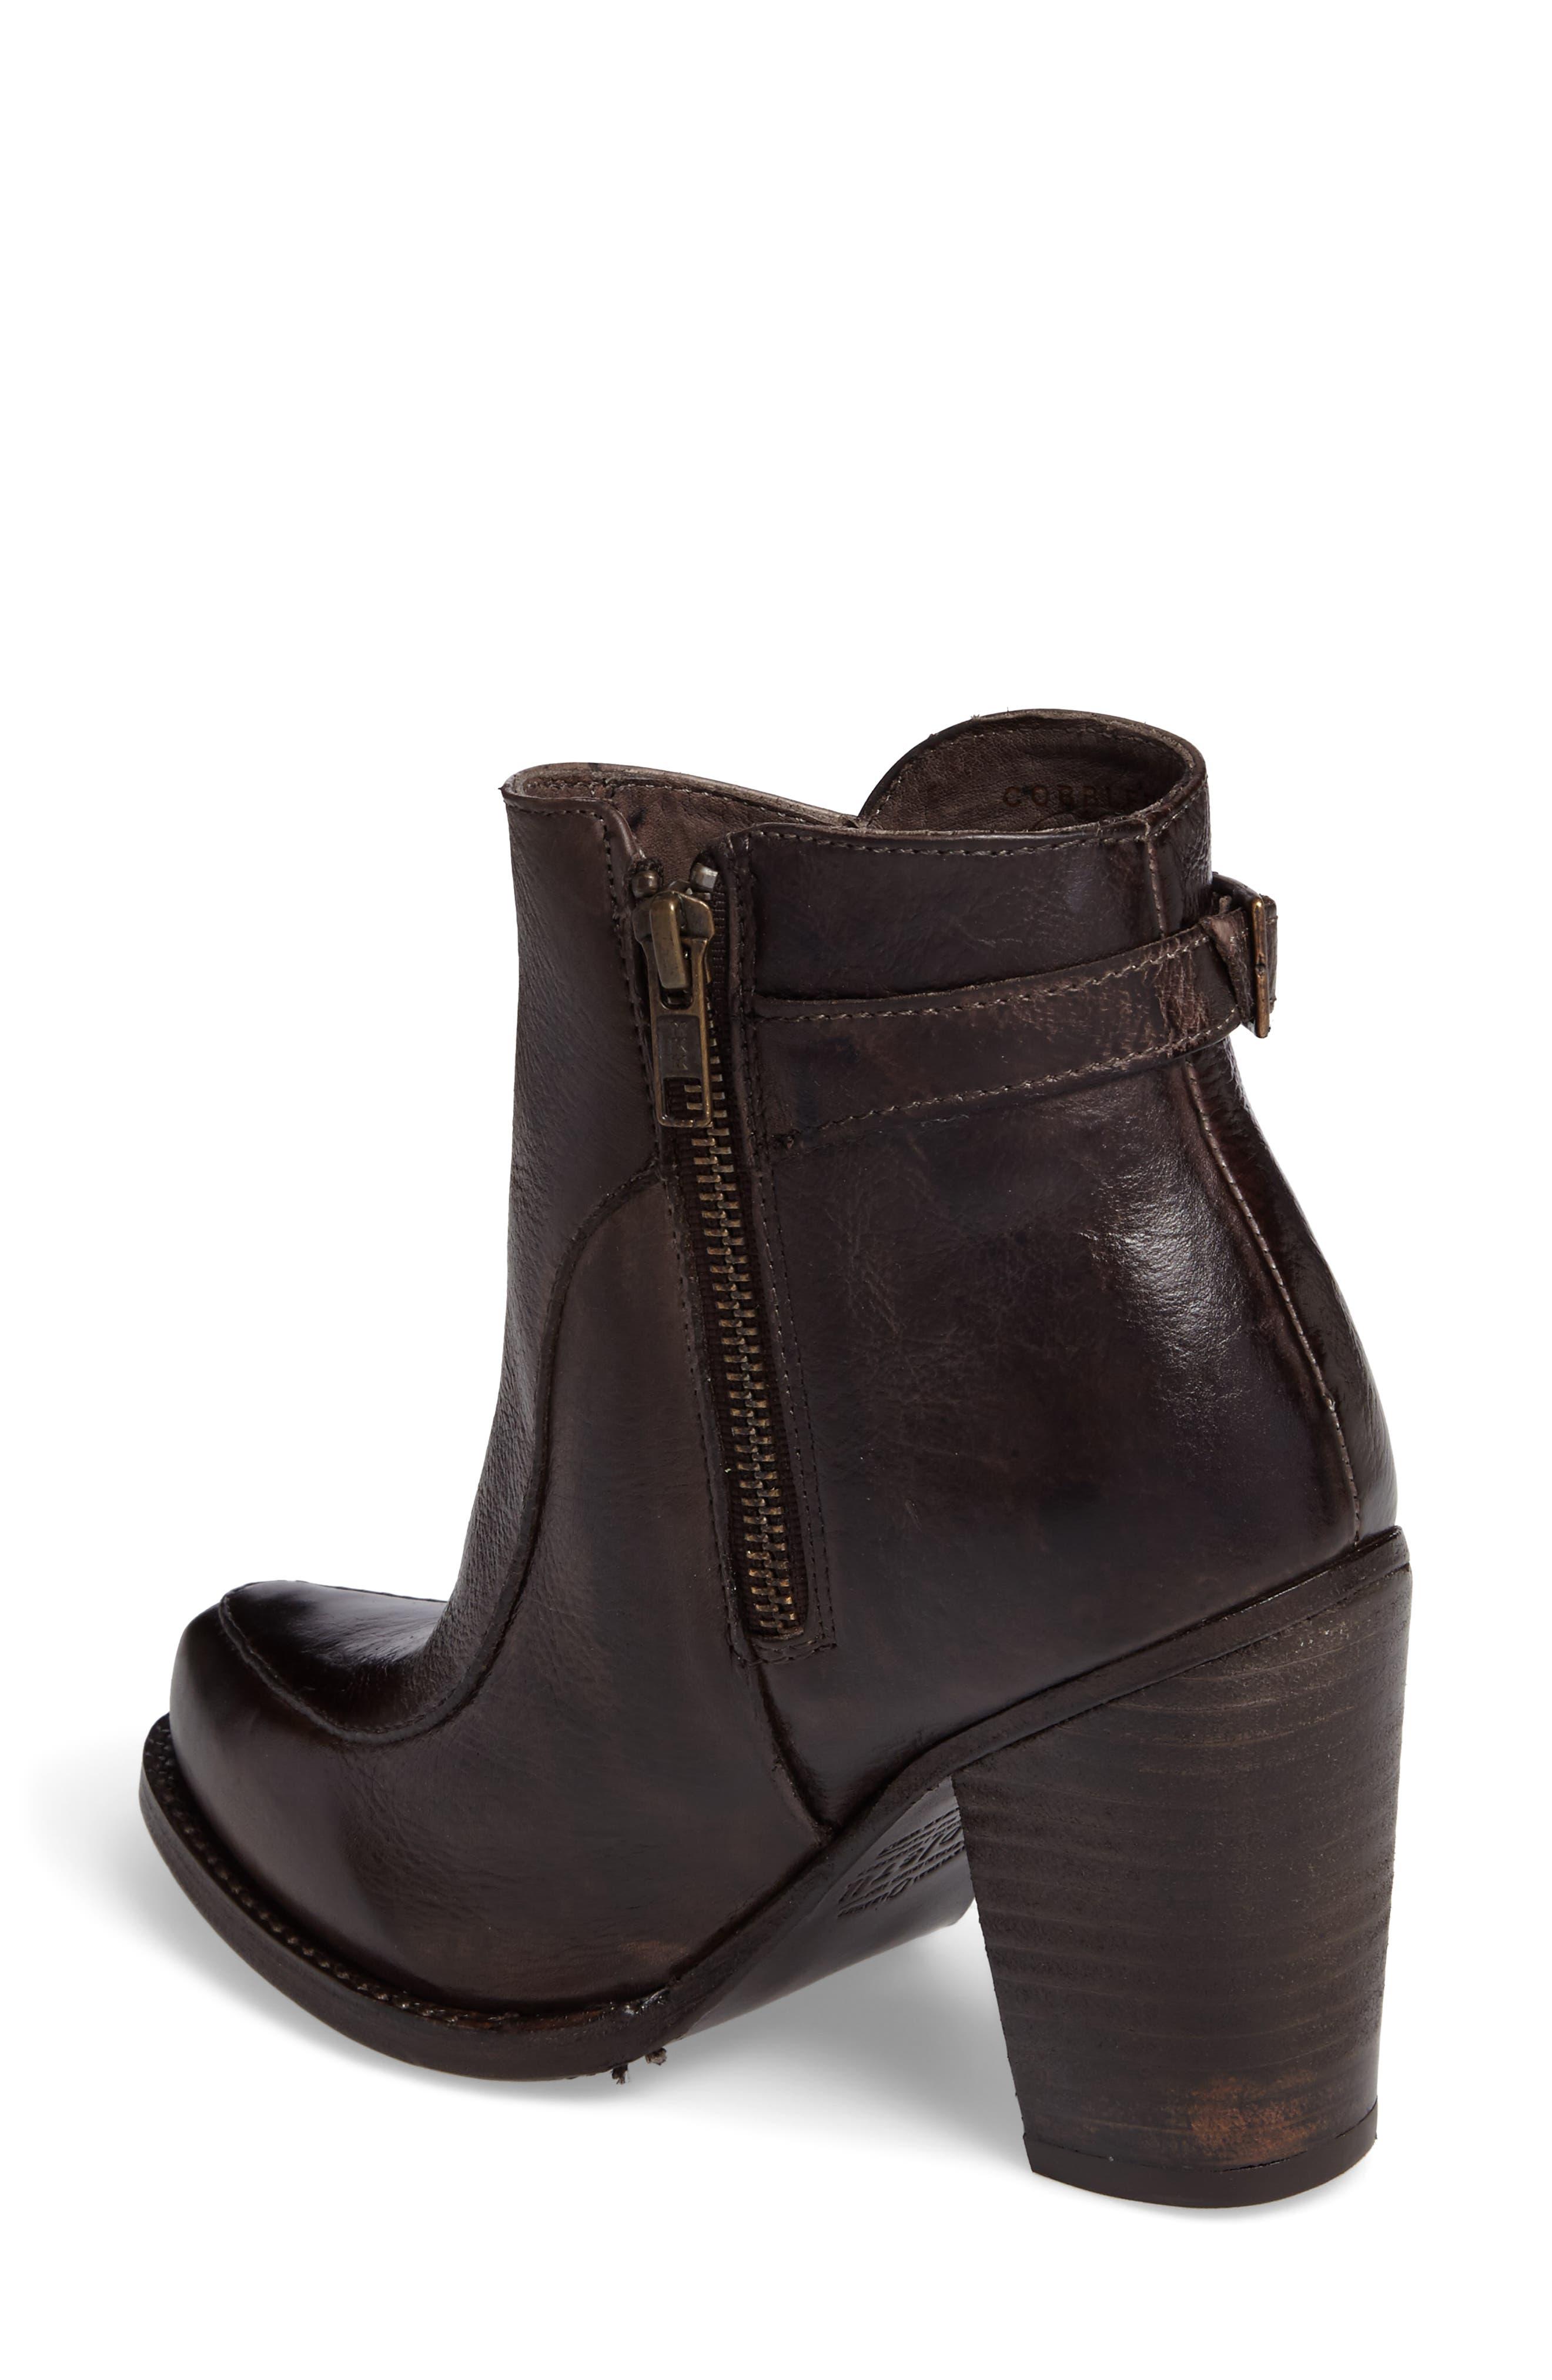 'Isla' Stacked Heel Boot,                             Alternate thumbnail 2, color,                             201